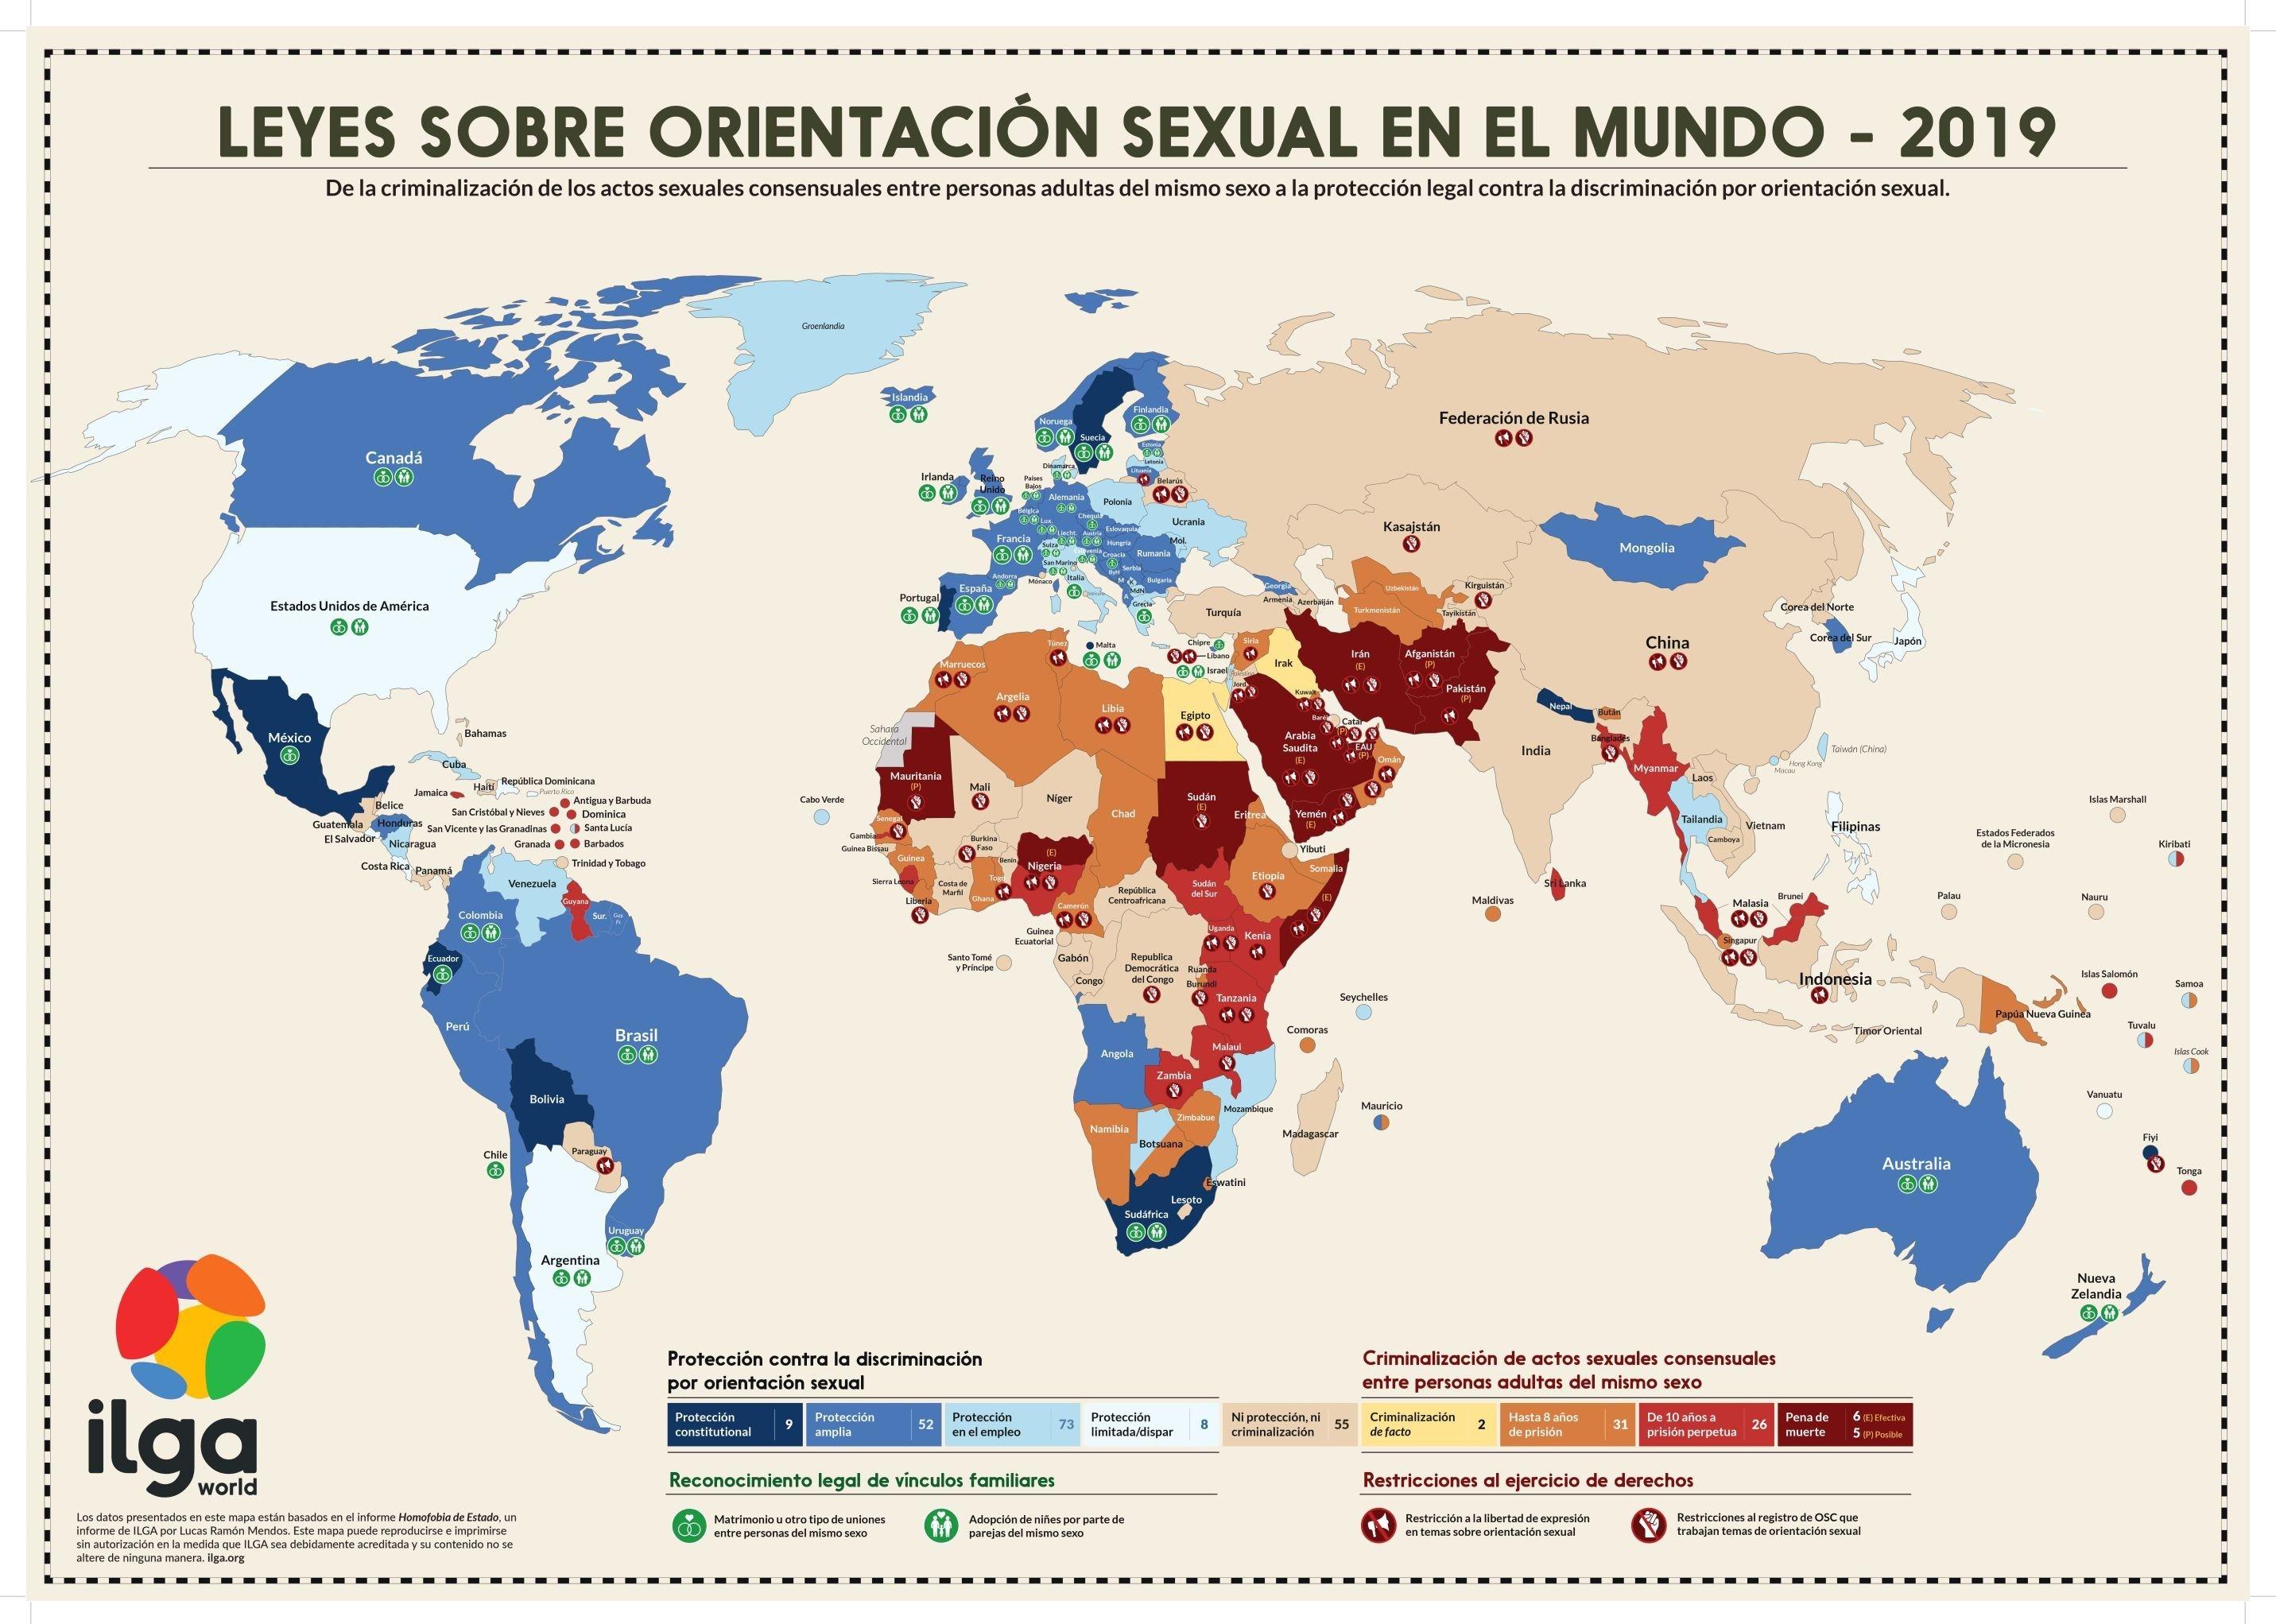 Mapamundi de la homofobia de Estado 2019  (clic para expandir)